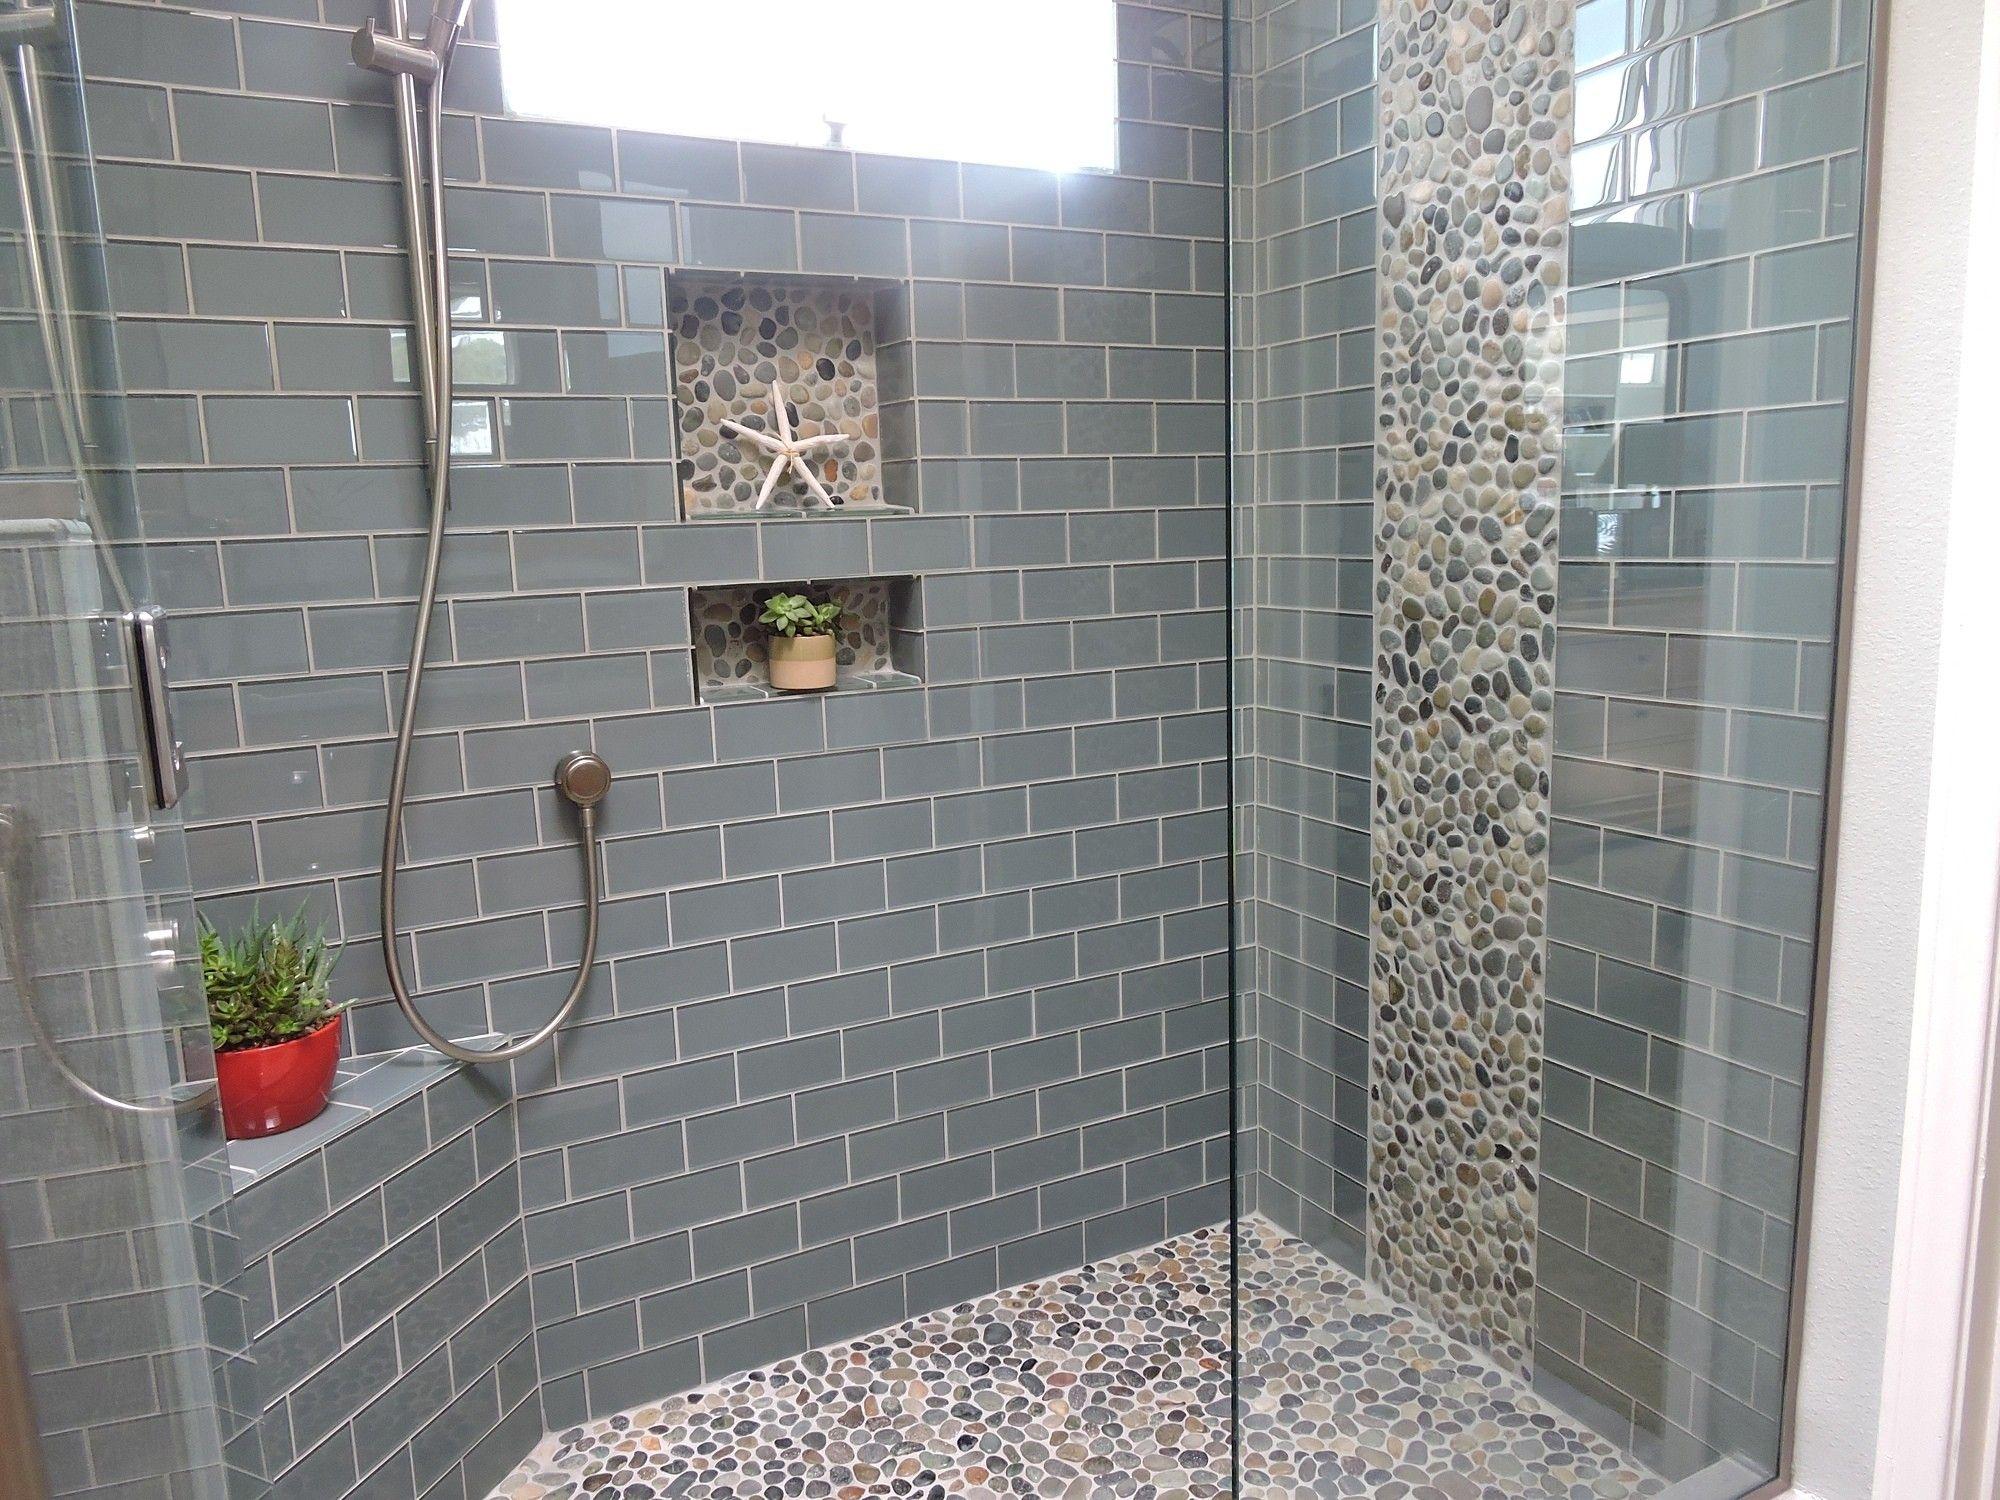 Elegant Elegant Gray Bathroom Tile Ideas Glass Tile Decorations Bathroom Images Subway Tile Bat Bathroom Shower Tile Glass Tile Shower Pebble Tile Shower Floor